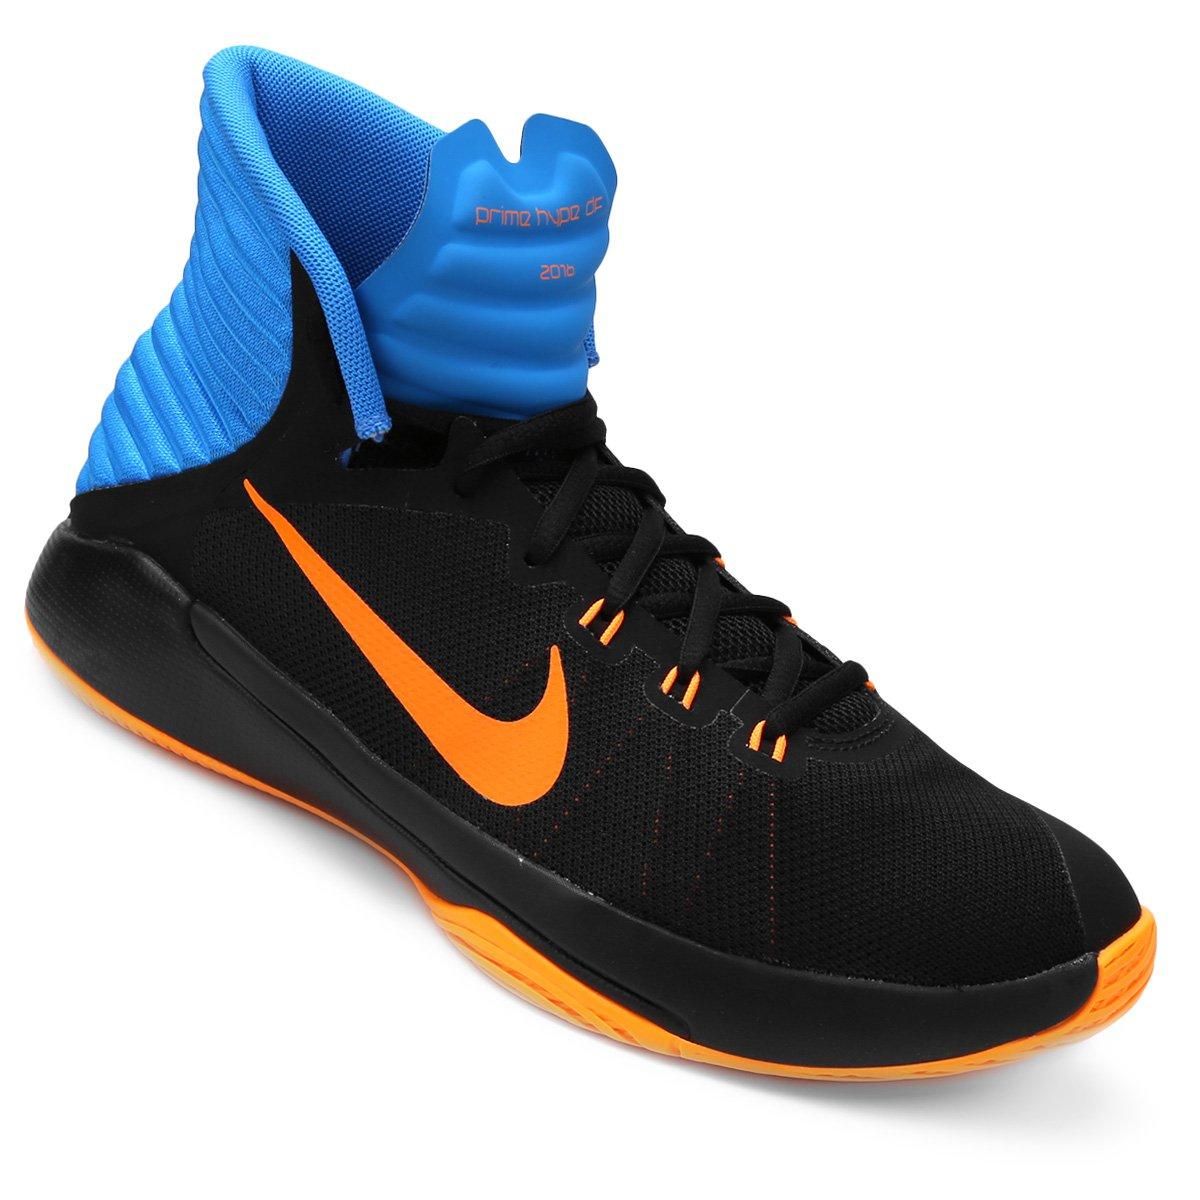 a54faecc708dd Tênis Nike Prime Hype DF - Compre Agora